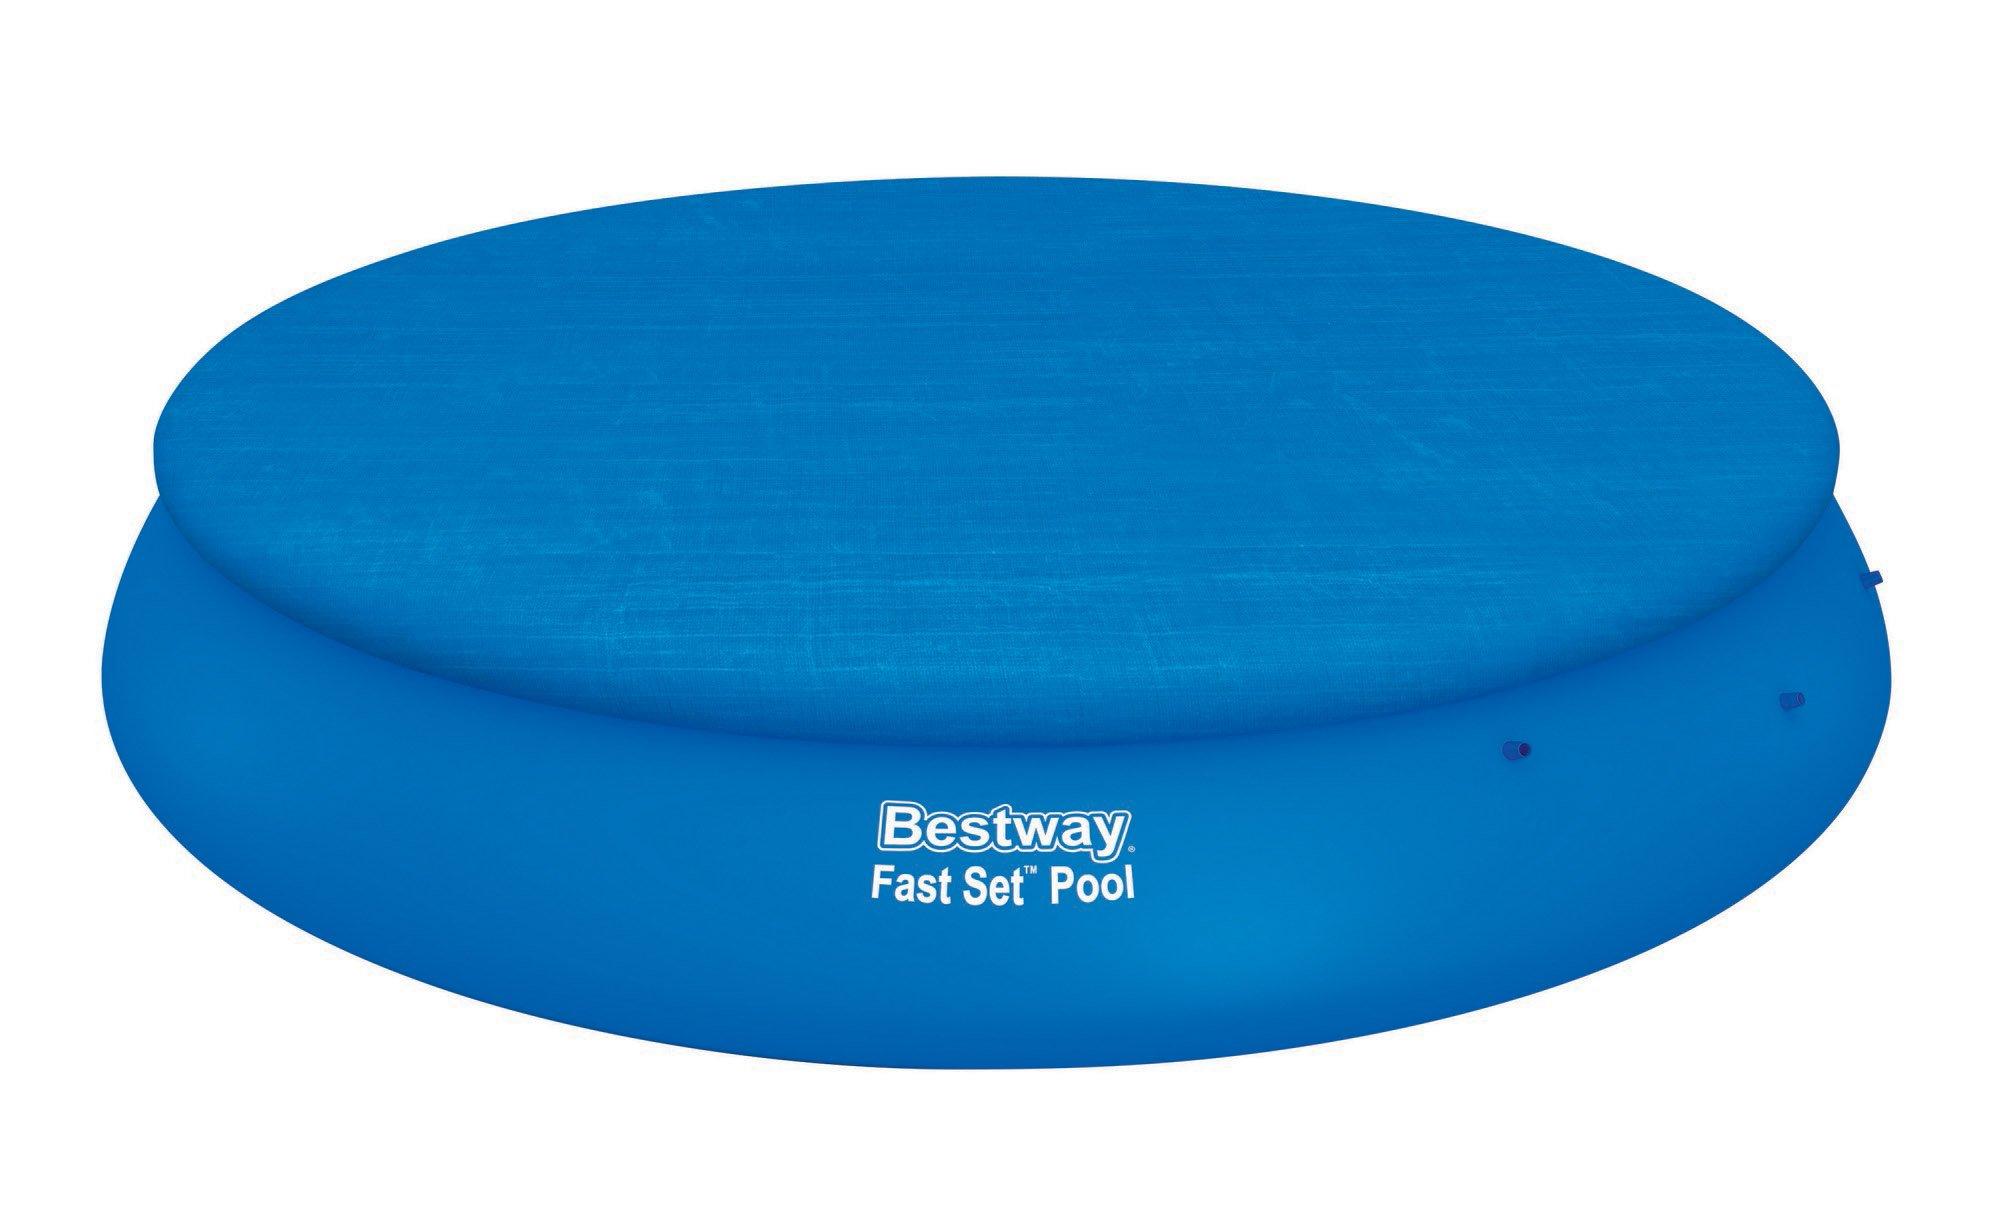 Bestway krycí plachta na bazén s límcem kryt 495 cm